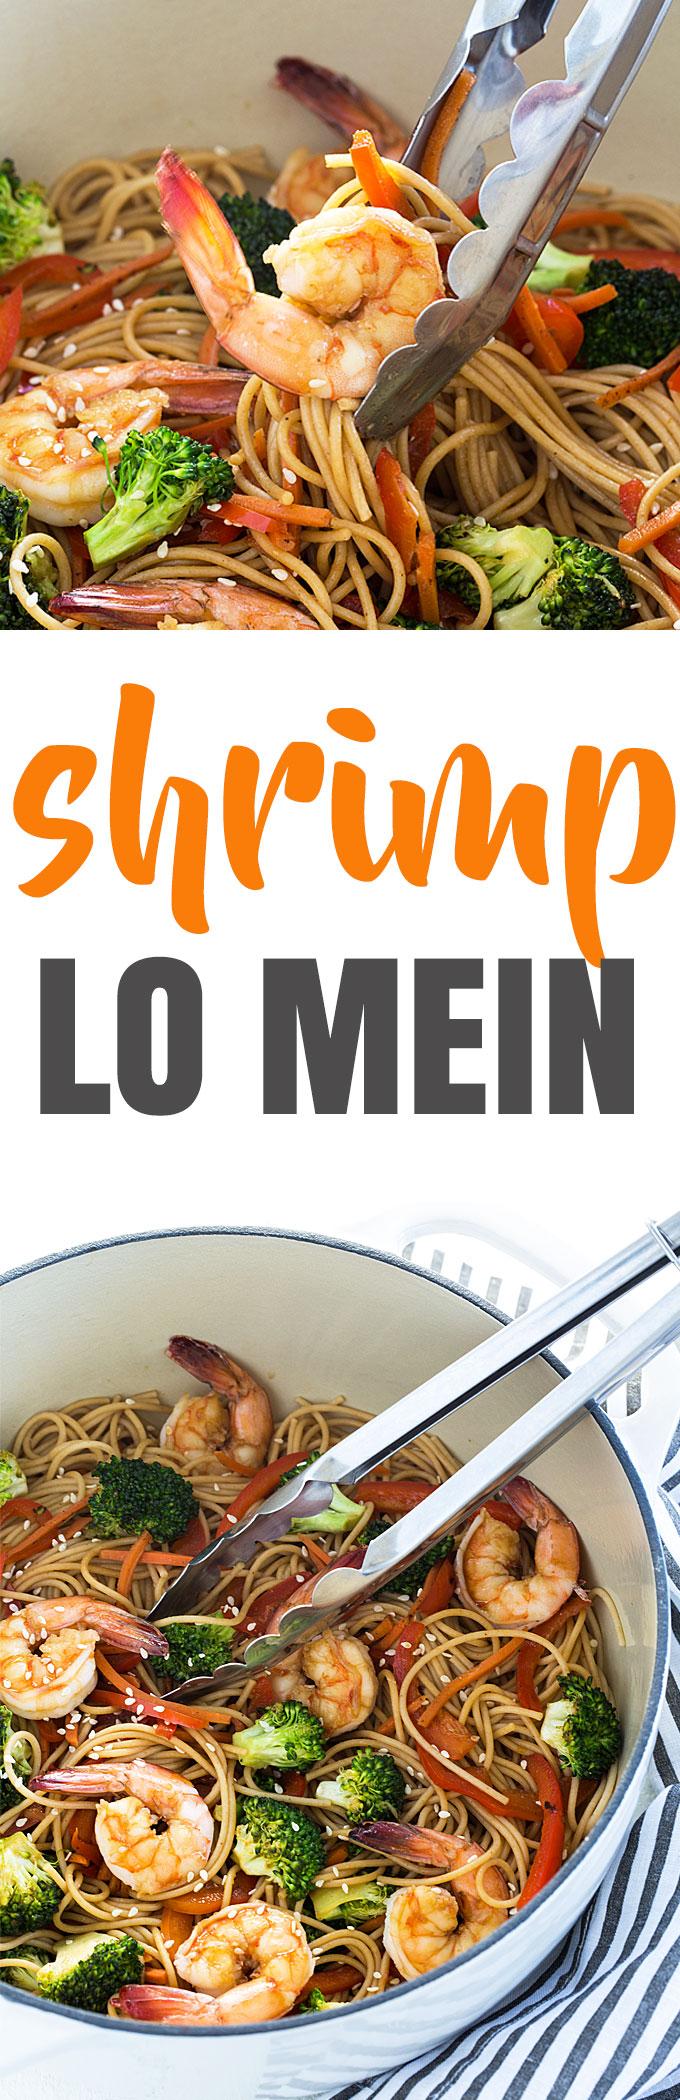 Gracious Shrimp Broccoli Lo Mein Blond Cook Shrimp Lo Mein S Shrimp Lo Mein Near Me Make Meal Shrimp Broccoli Lo Mein Skip Takeout nice food Shrimp Lo Mein